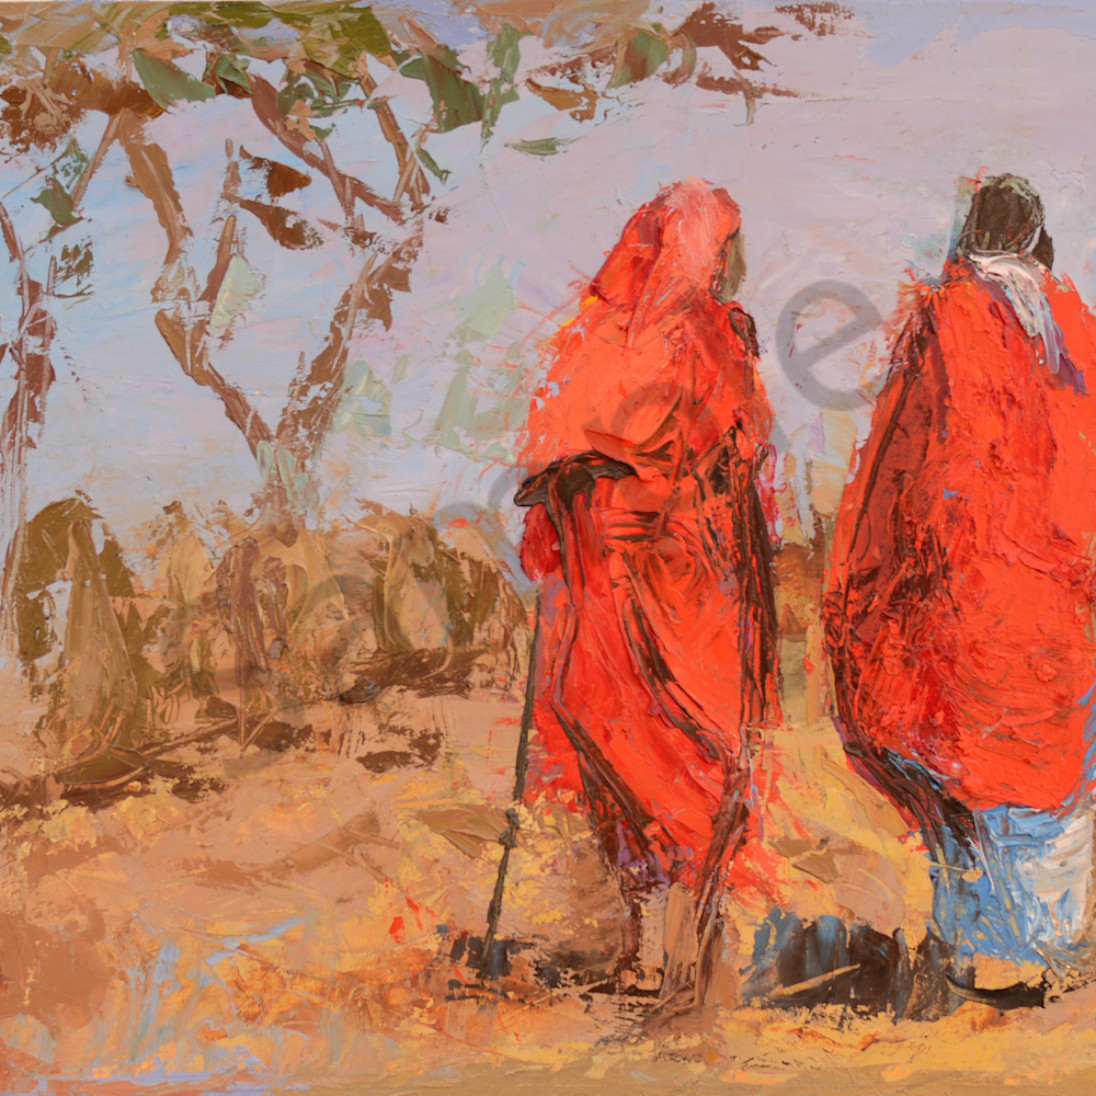 Two maasai warriors herding cattle 9x12 zprlbi